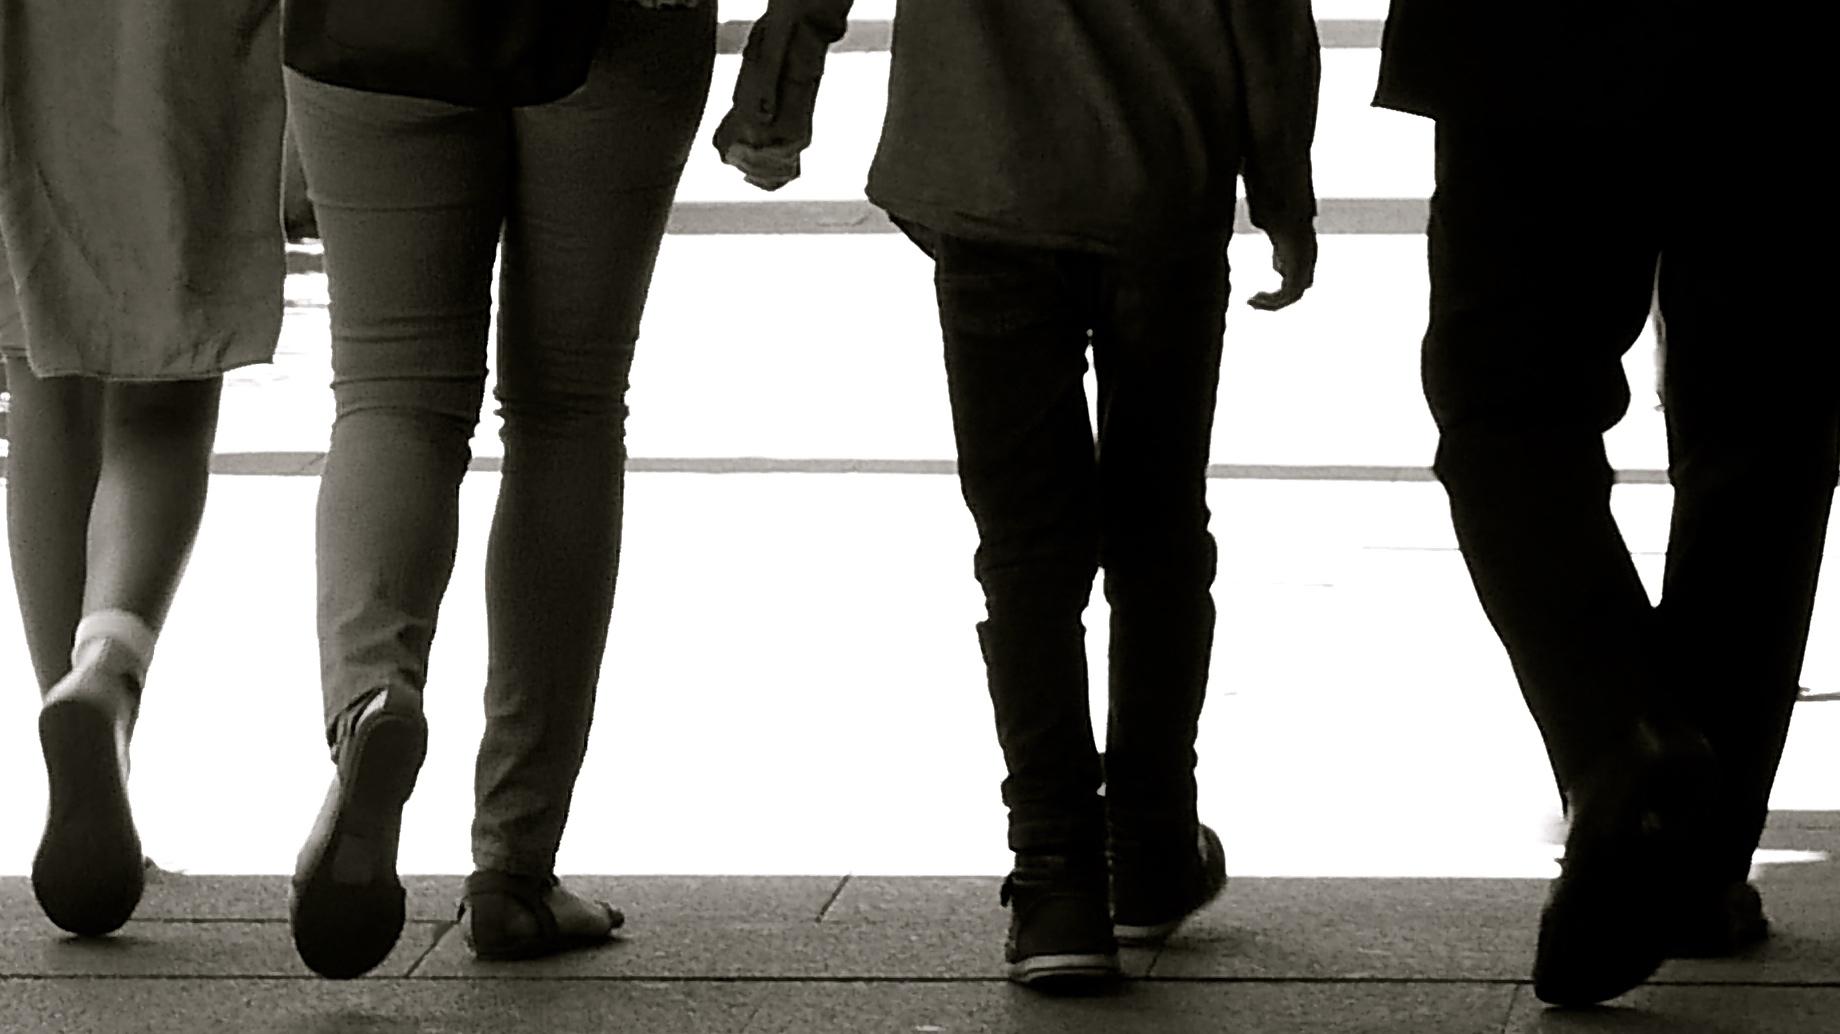 Familia caminando contraluz